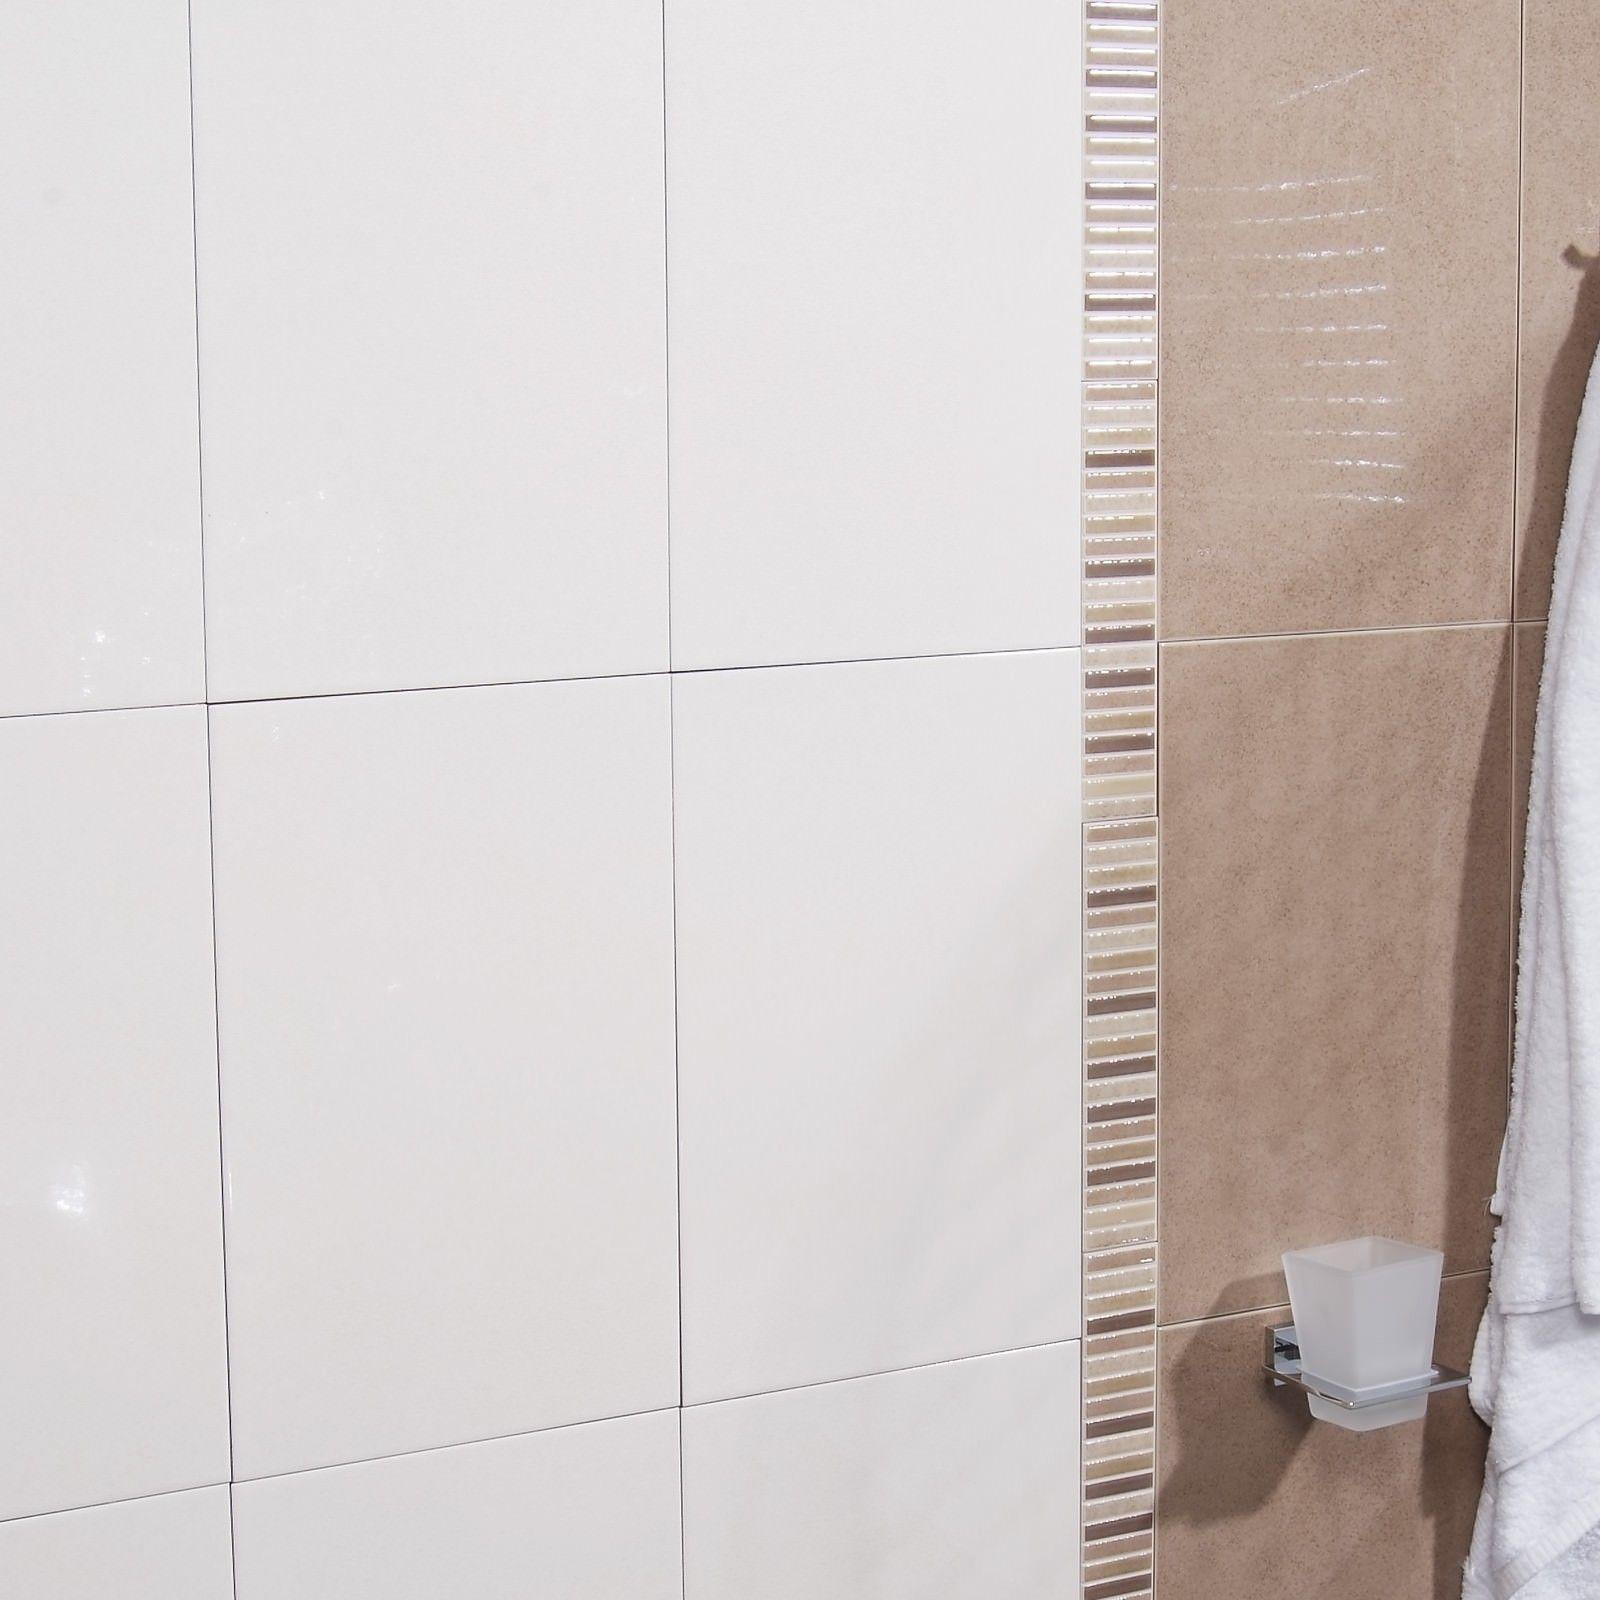 Duo Blanco Wall Tile - Black And White Bathroom Ideas - White Tiles ...